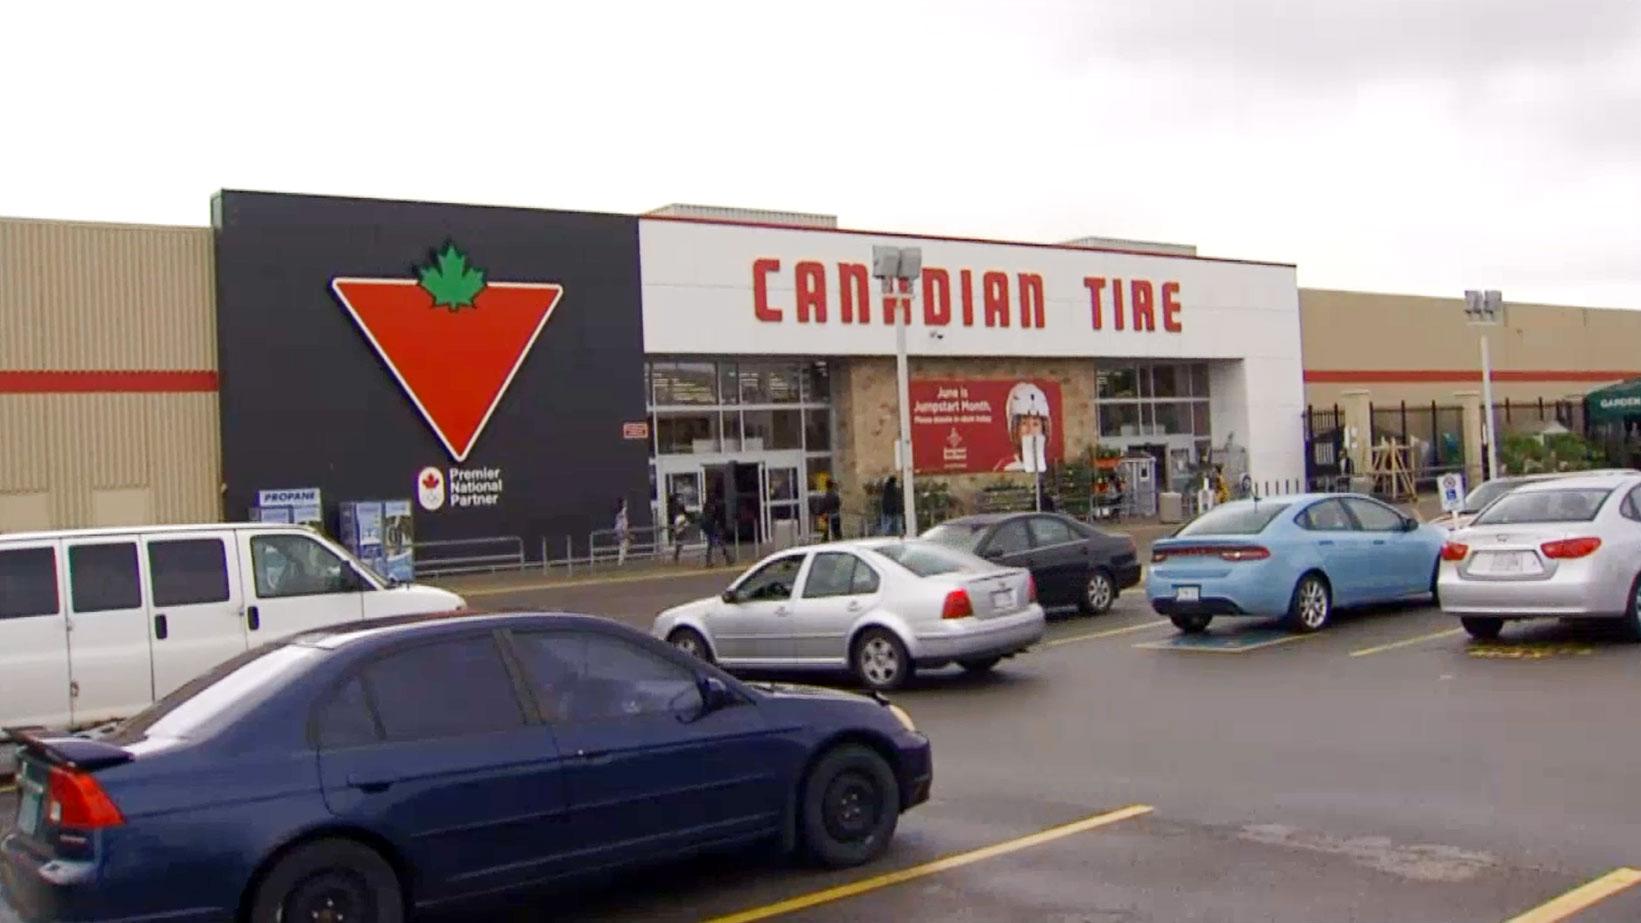 Woman screams 'Allahu Akbar' in Toronto store attack